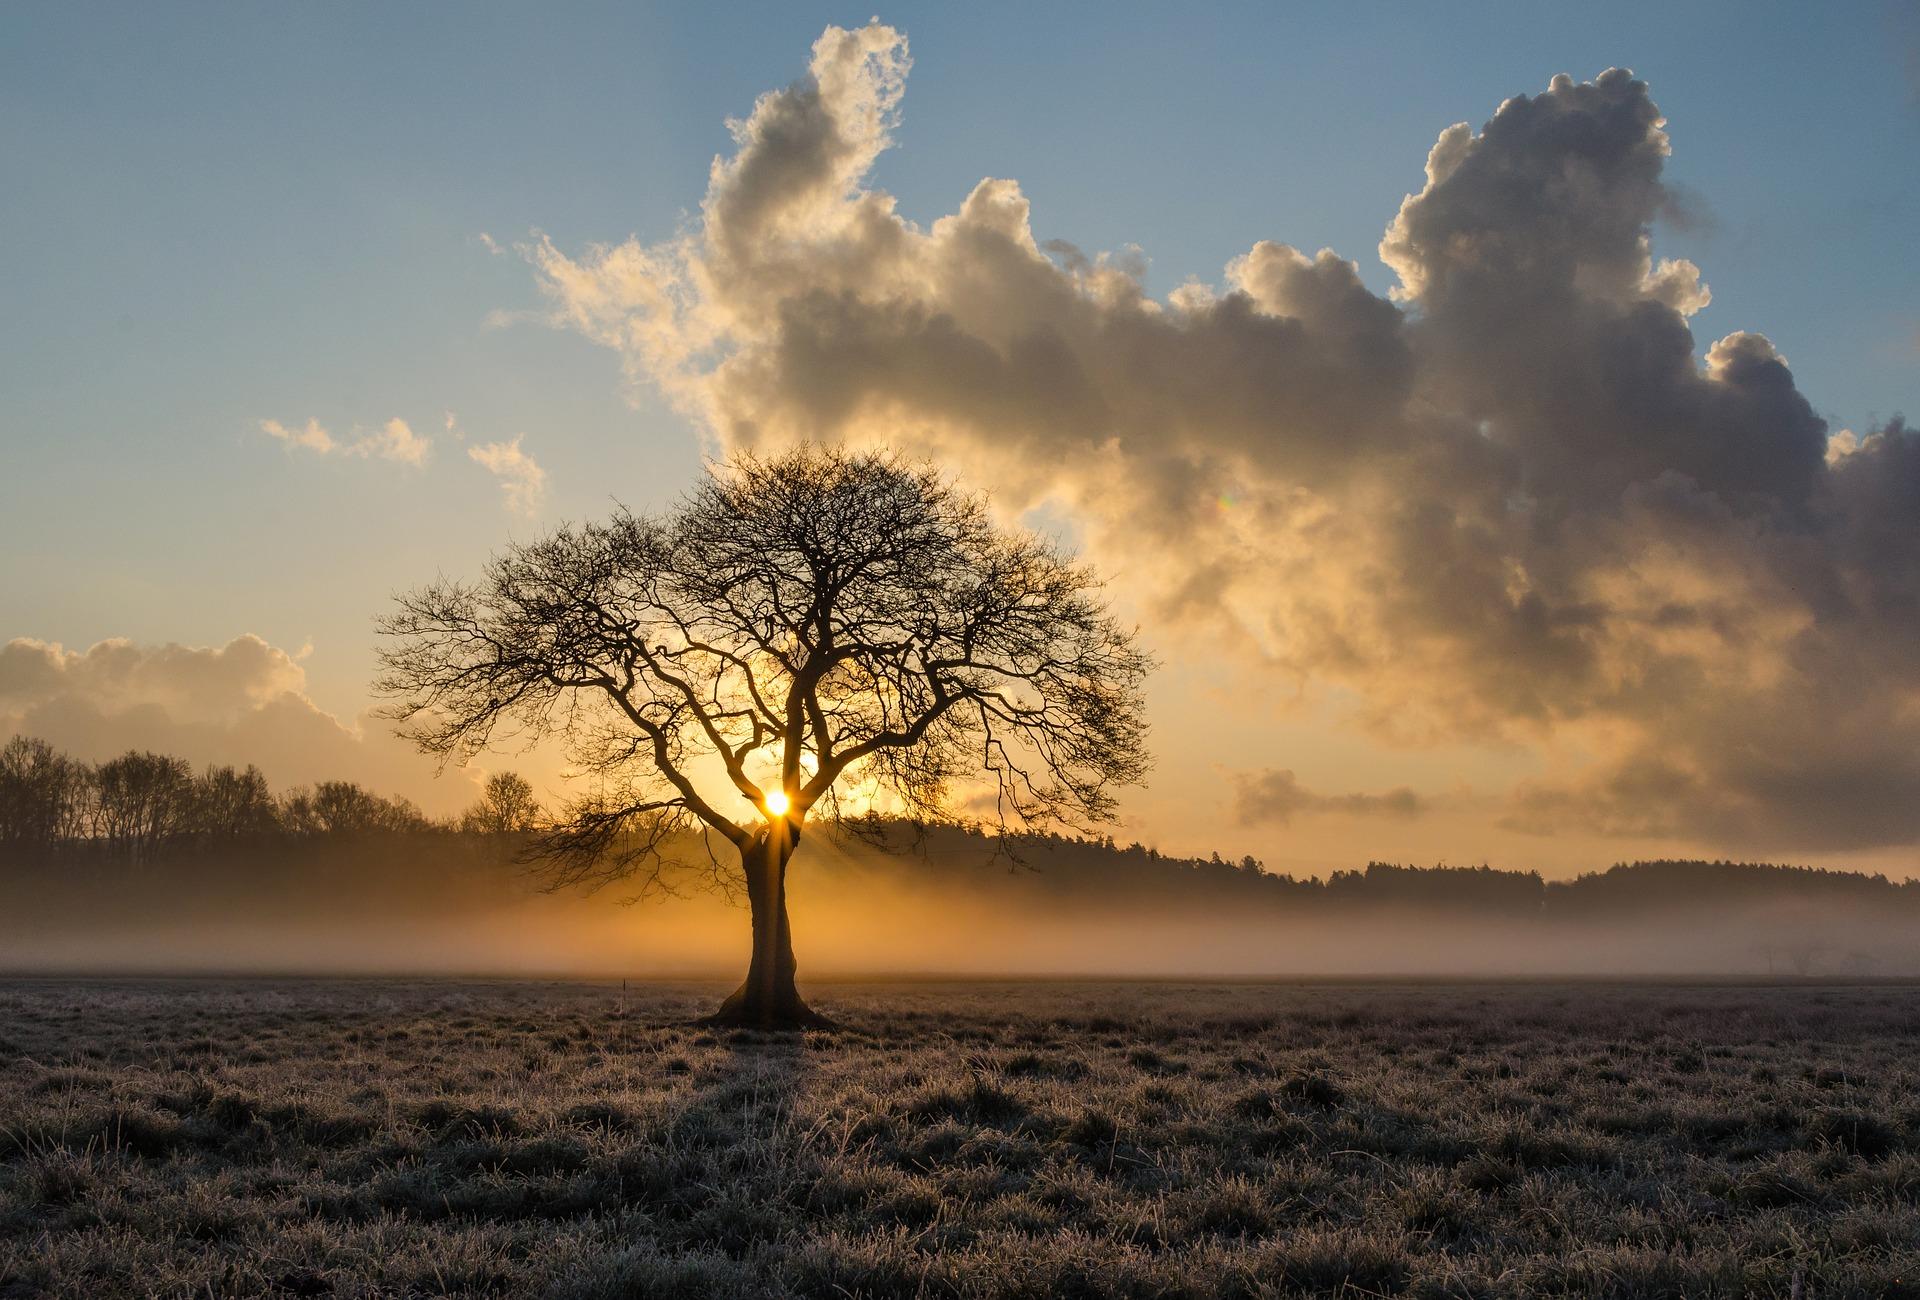 lone-tree-Landscape- photo - tip